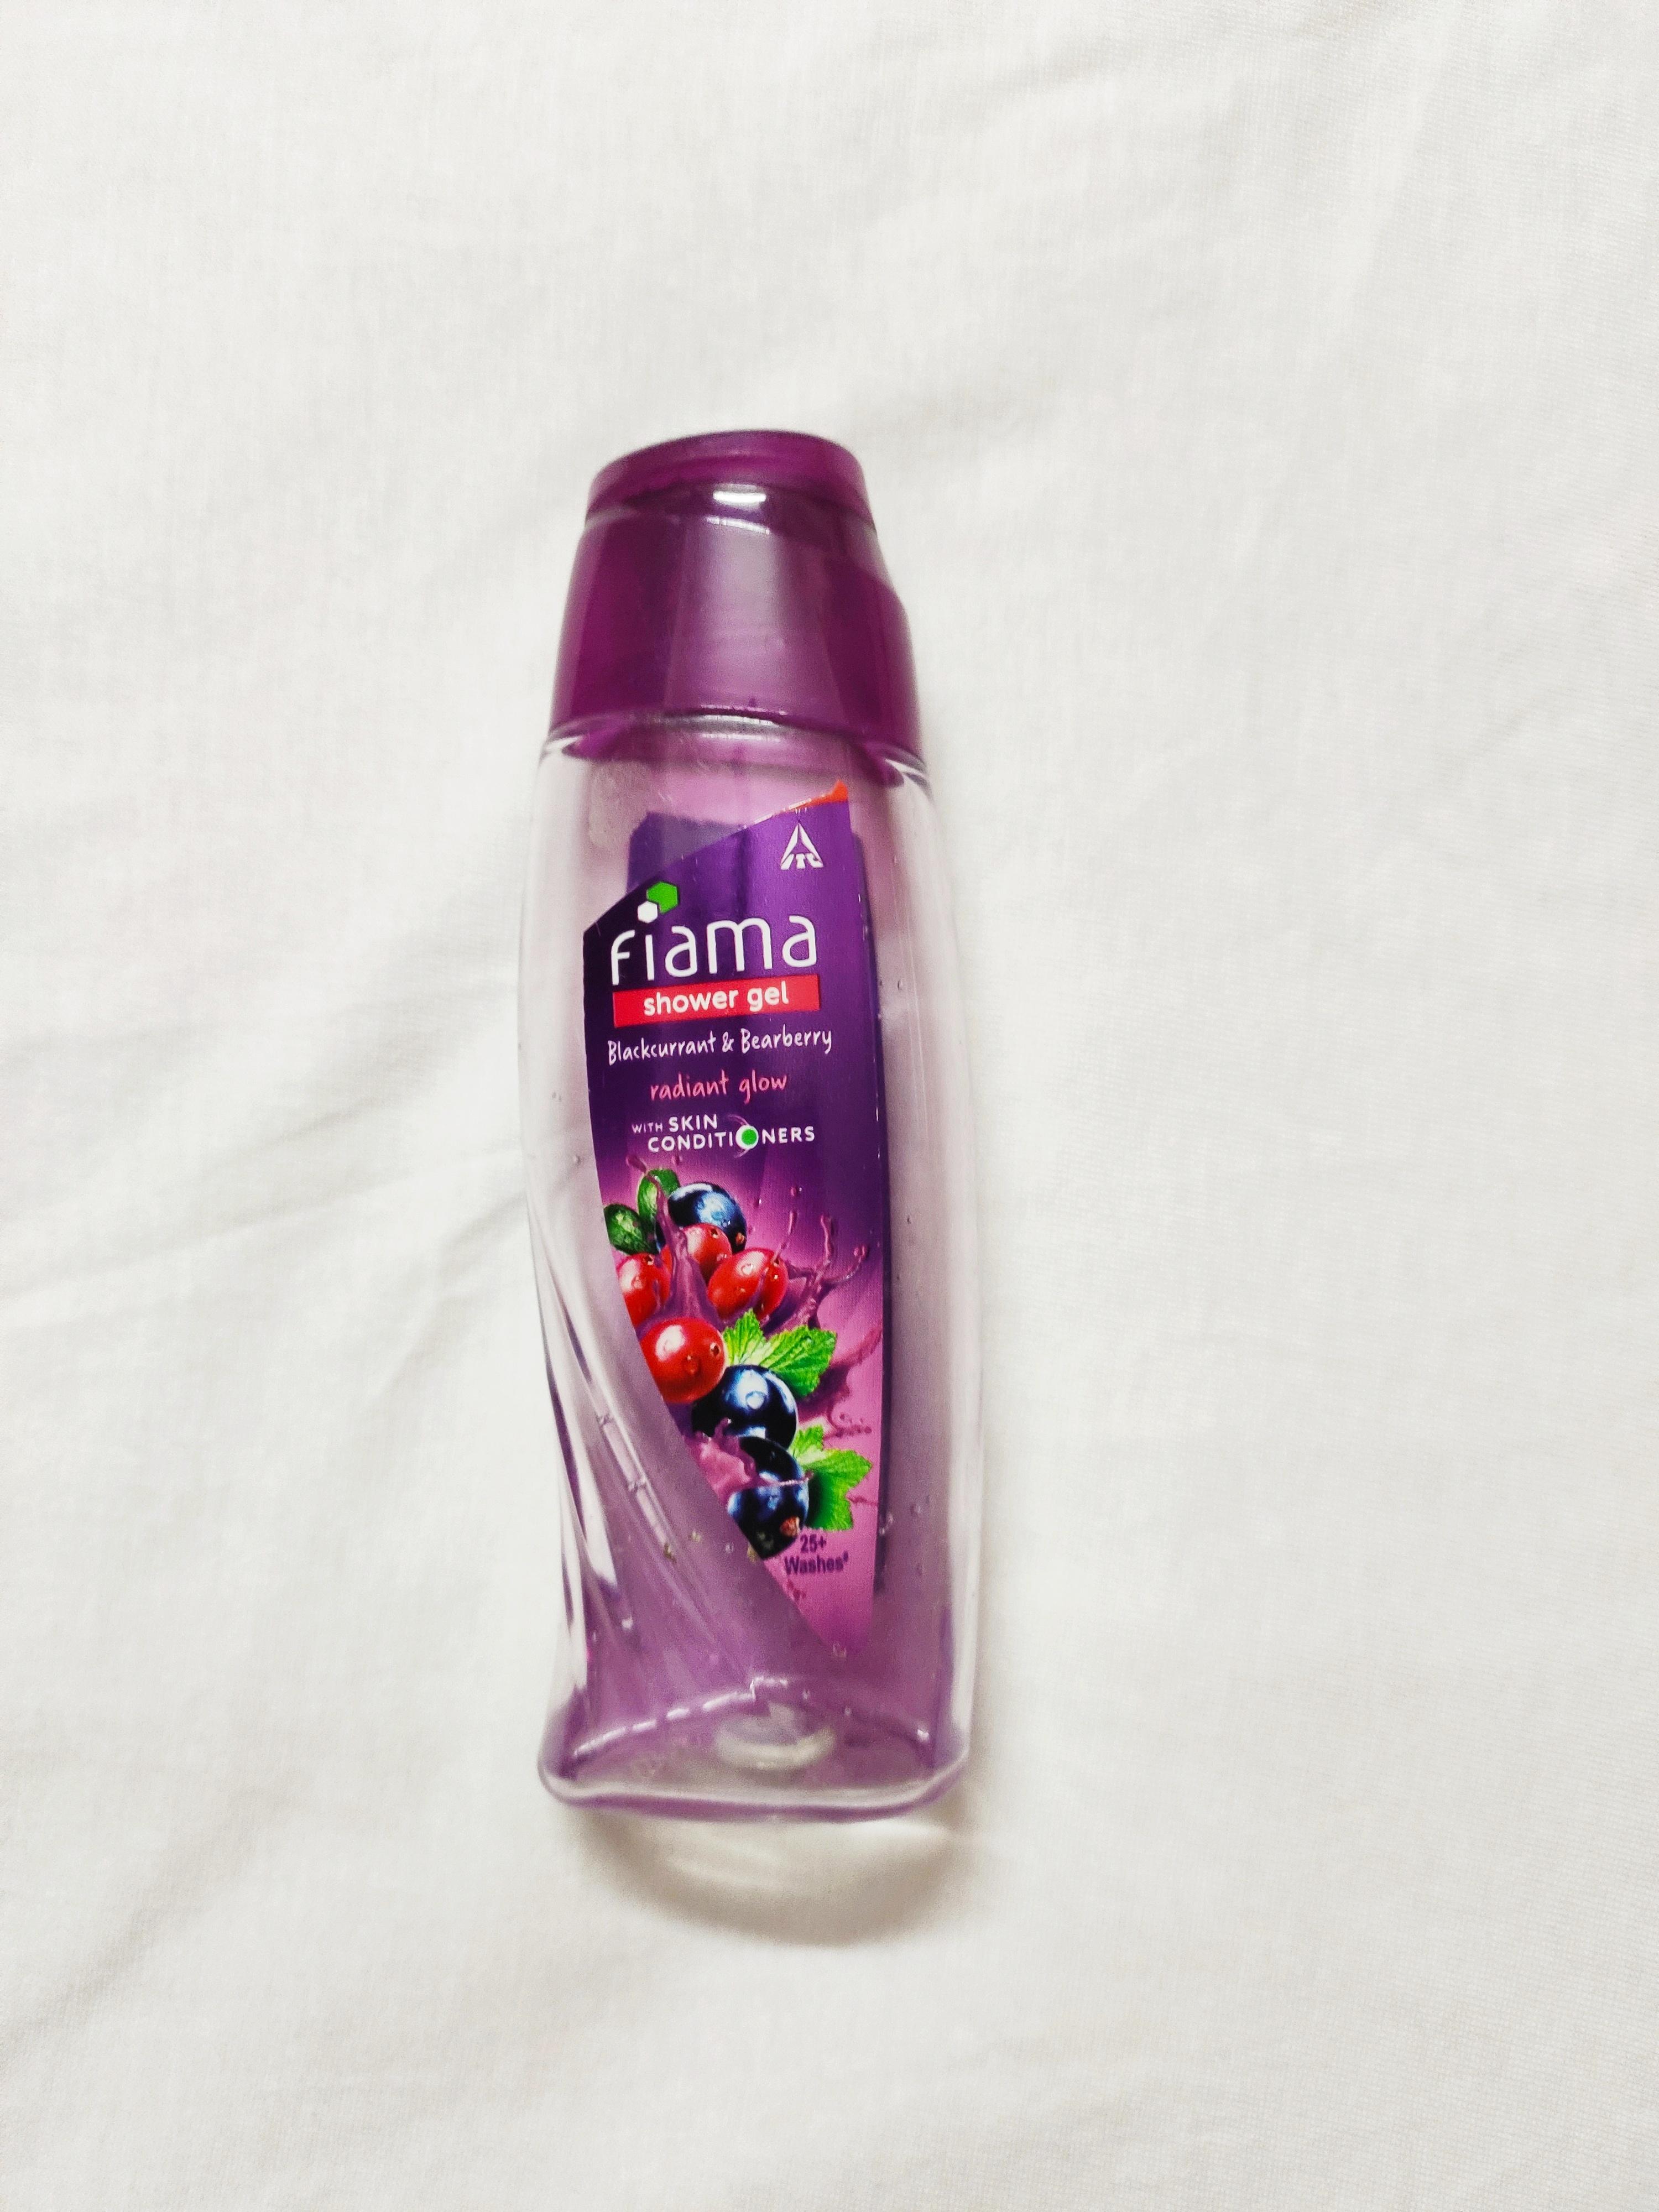 Fiama Blakcurrant & Bearberry Radiant Glow Gel Bar-Refreshing Fragrance-By tania_khan-3